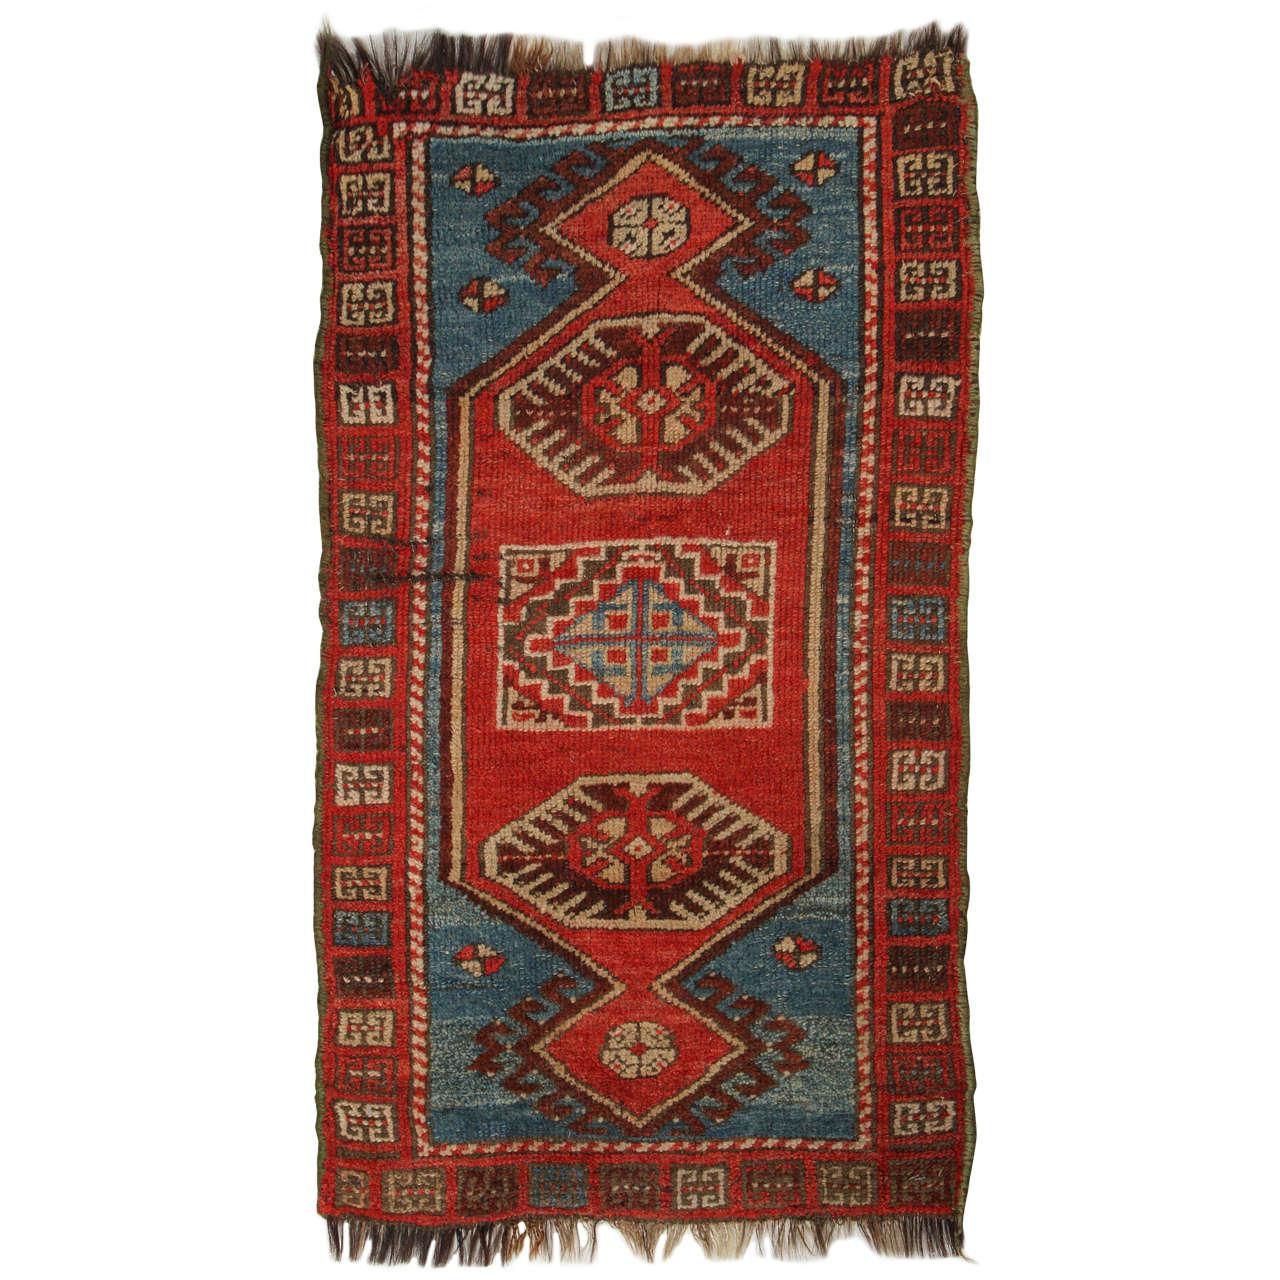 Turkish Yastik Rug: Turkish Yastik Rug, Red And Blue For Sale At 1stdibs